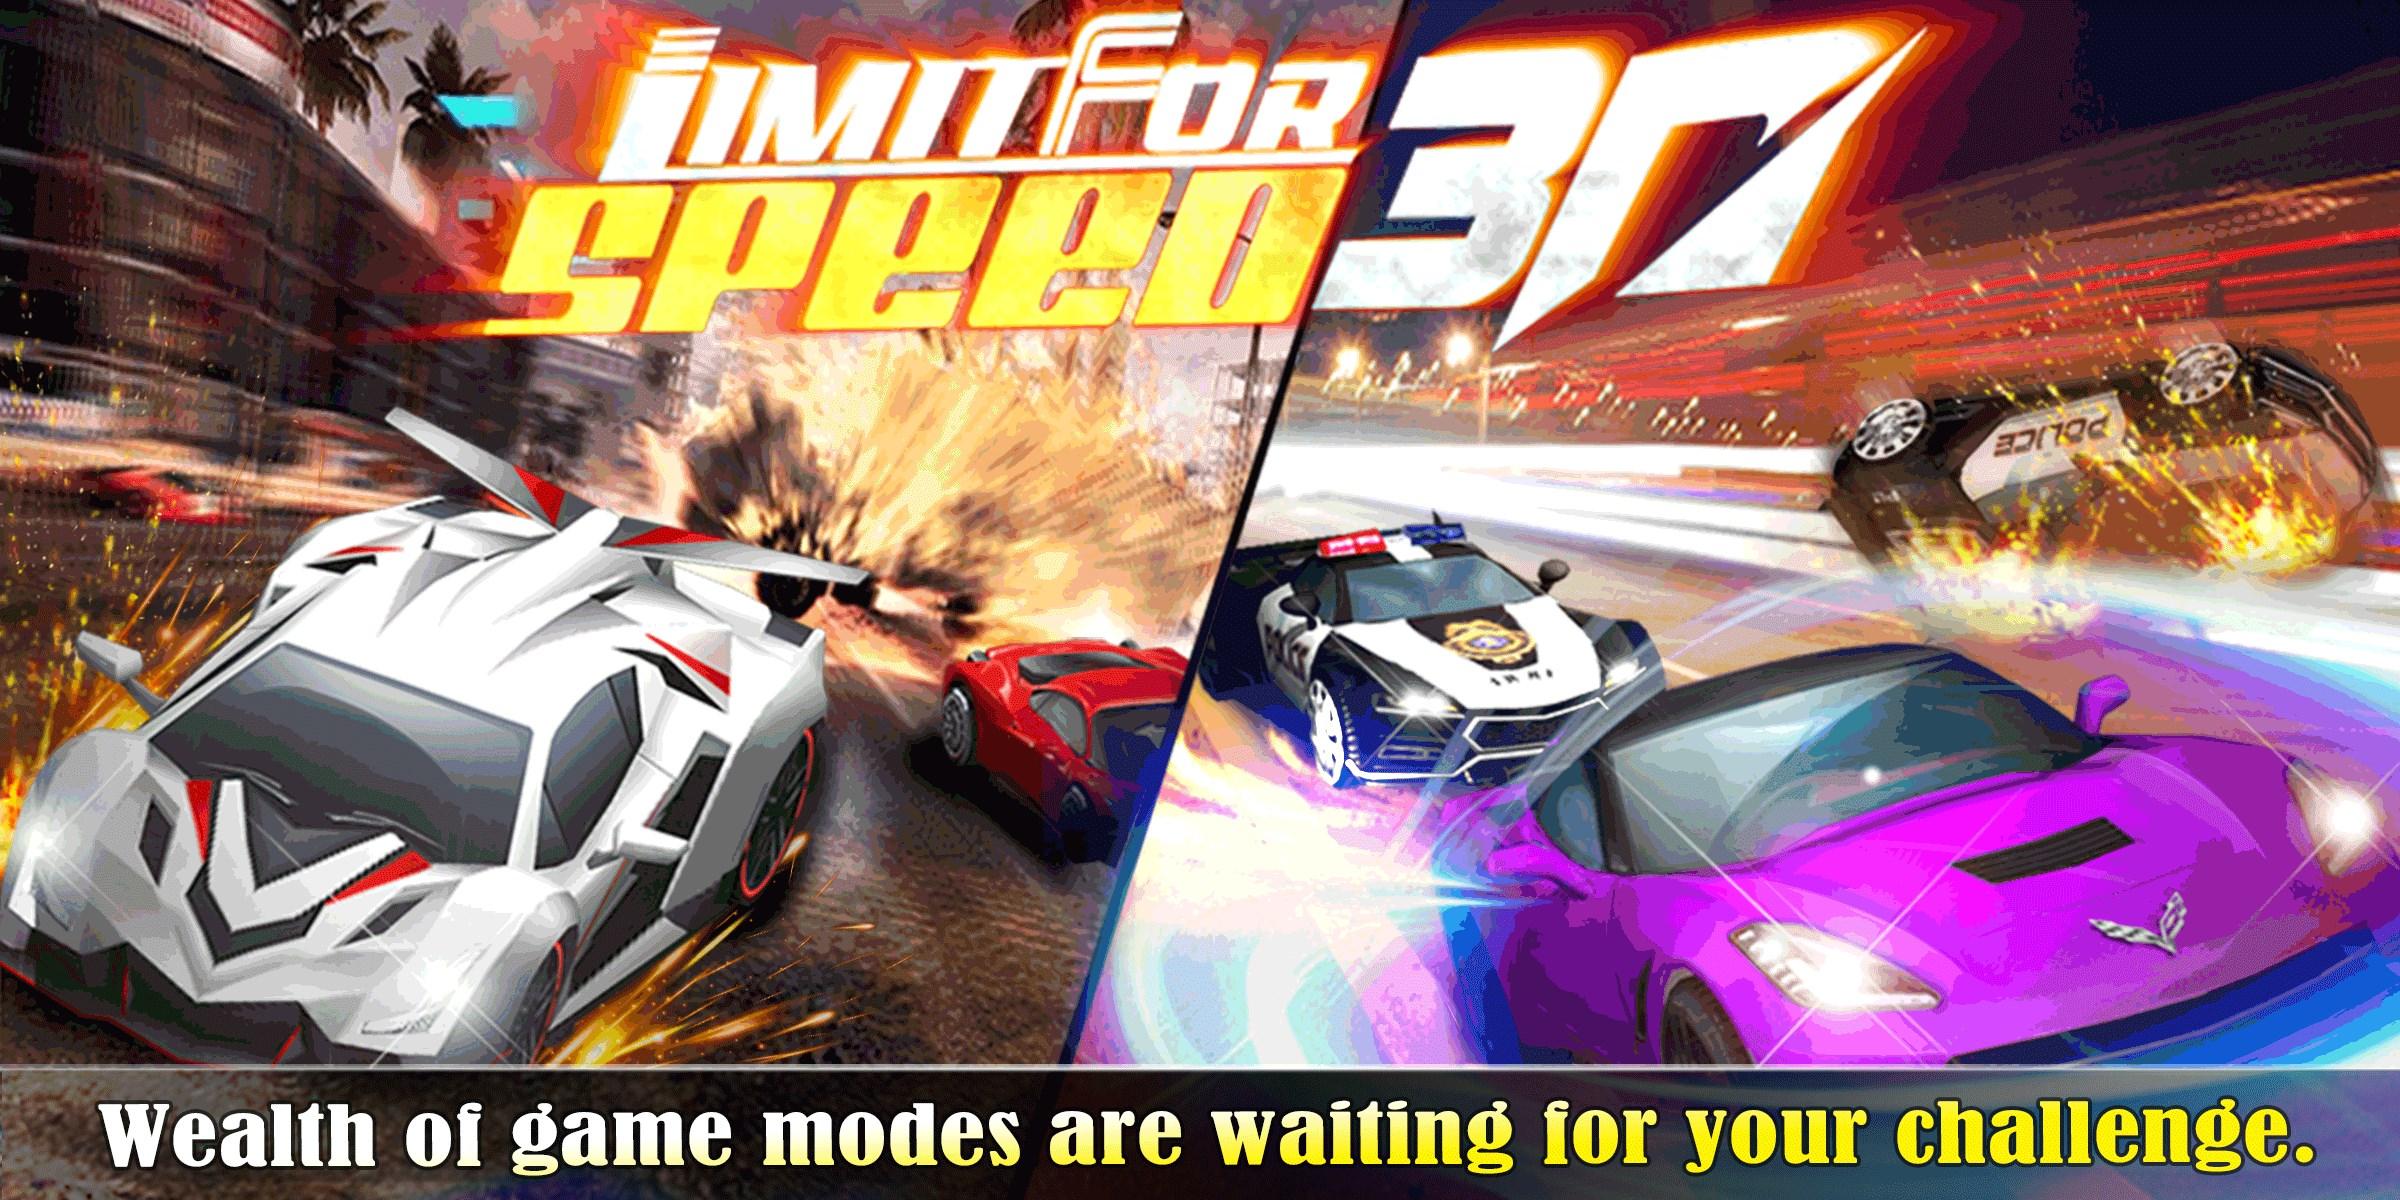 Get Racing Speed - No Limit Rider - Microsoft Store